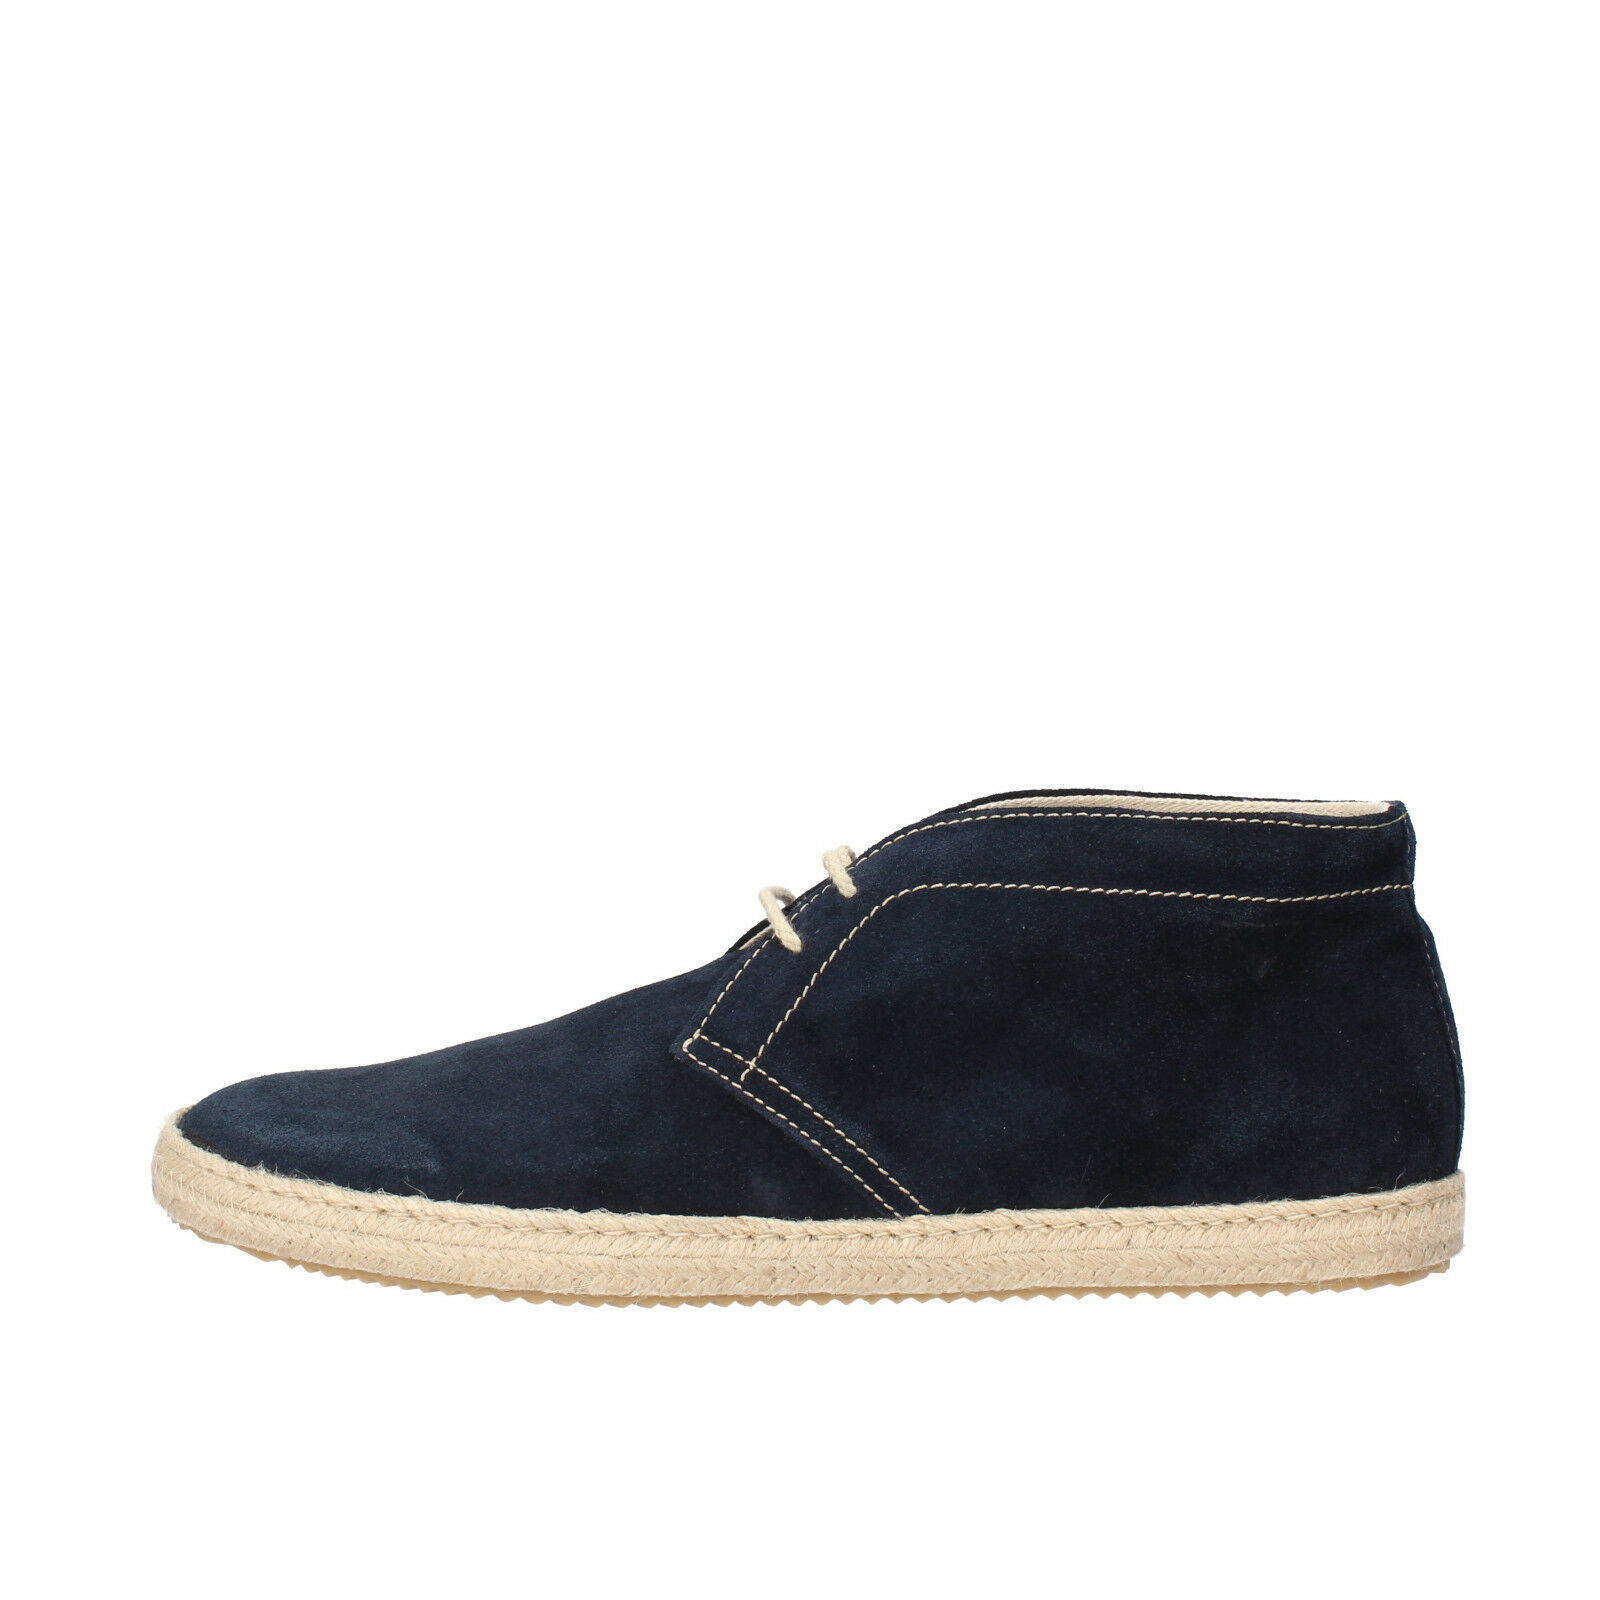 Mens shoes DOCKSTEPS 10 (EU 44) desert boots bluee suede AG841-D